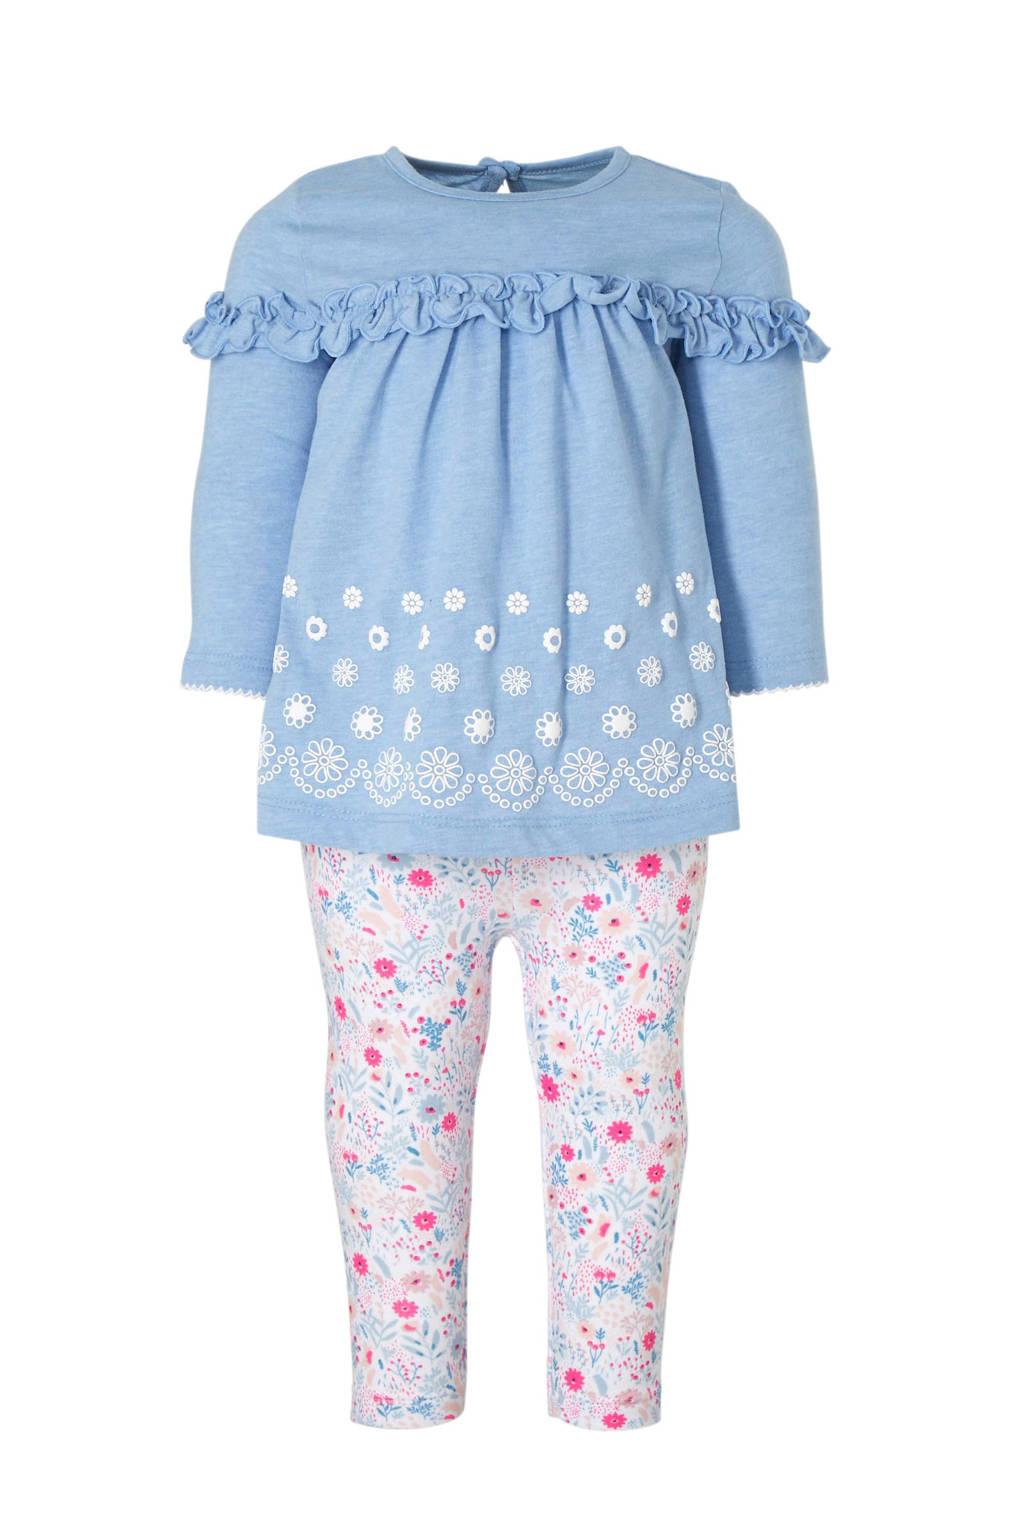 C&A Baby Club jurk + legging, Blauw/wit/roze